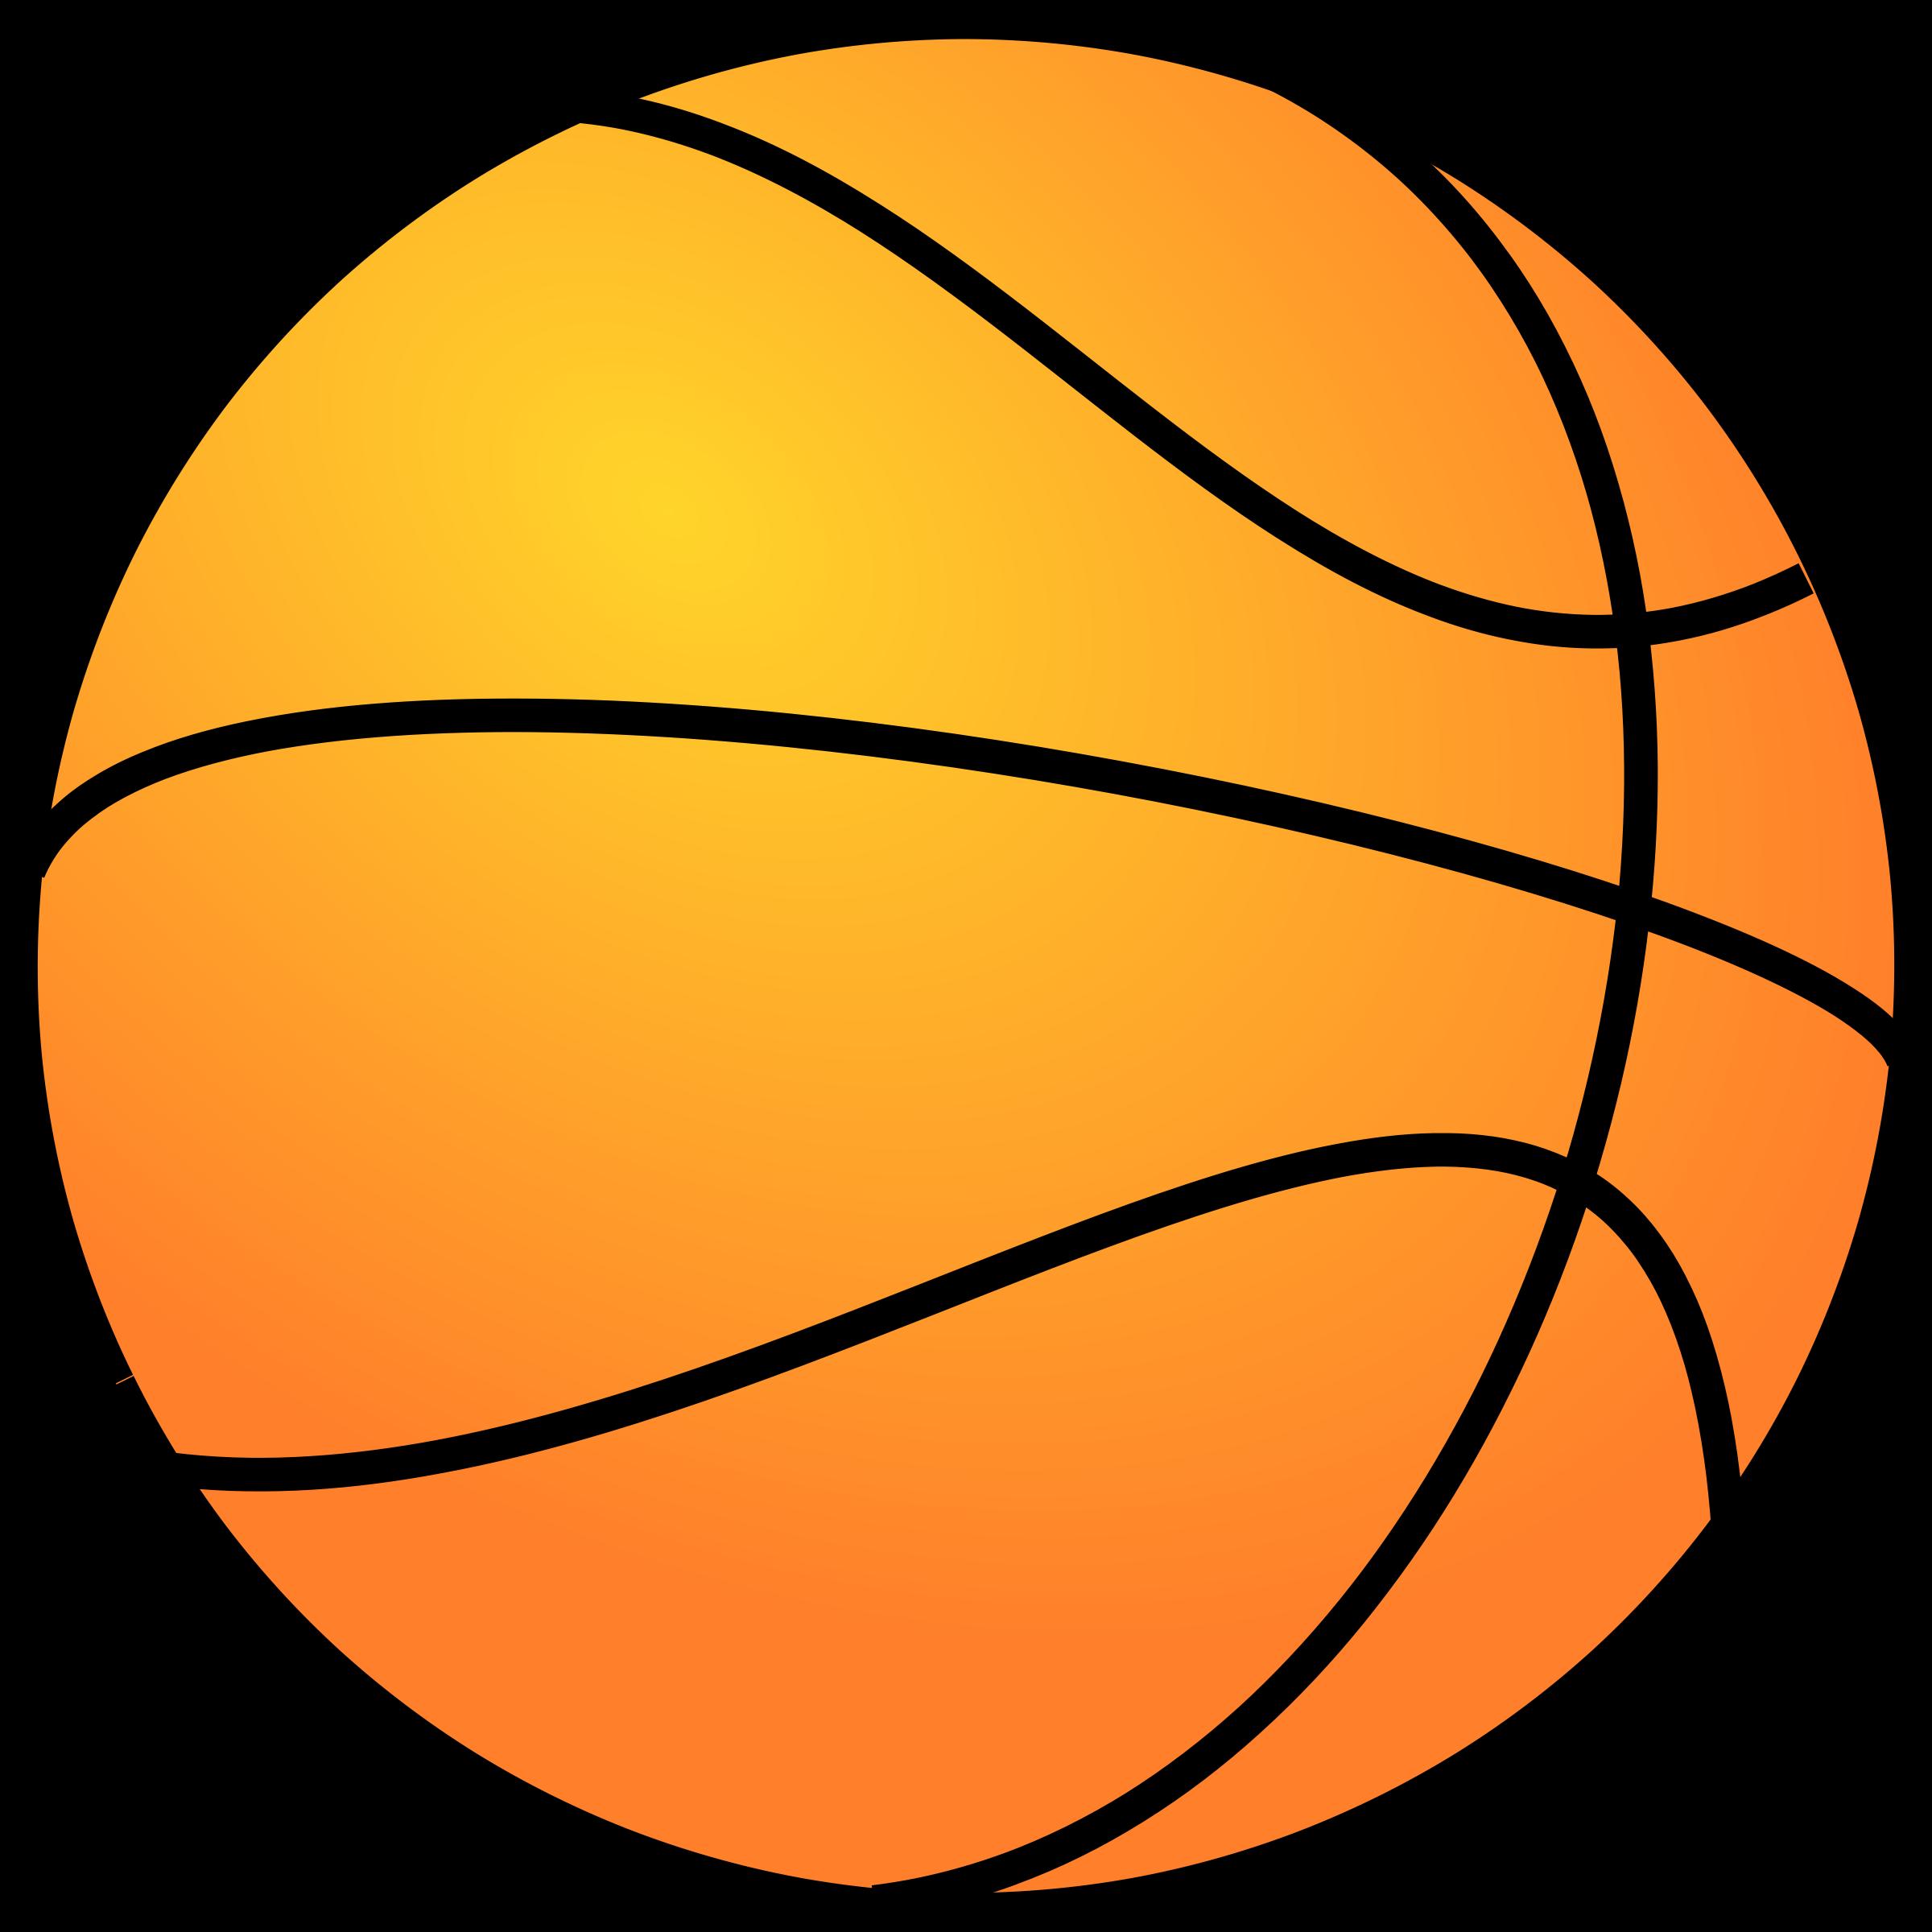 2400x2400 Basketball Images Clip Art